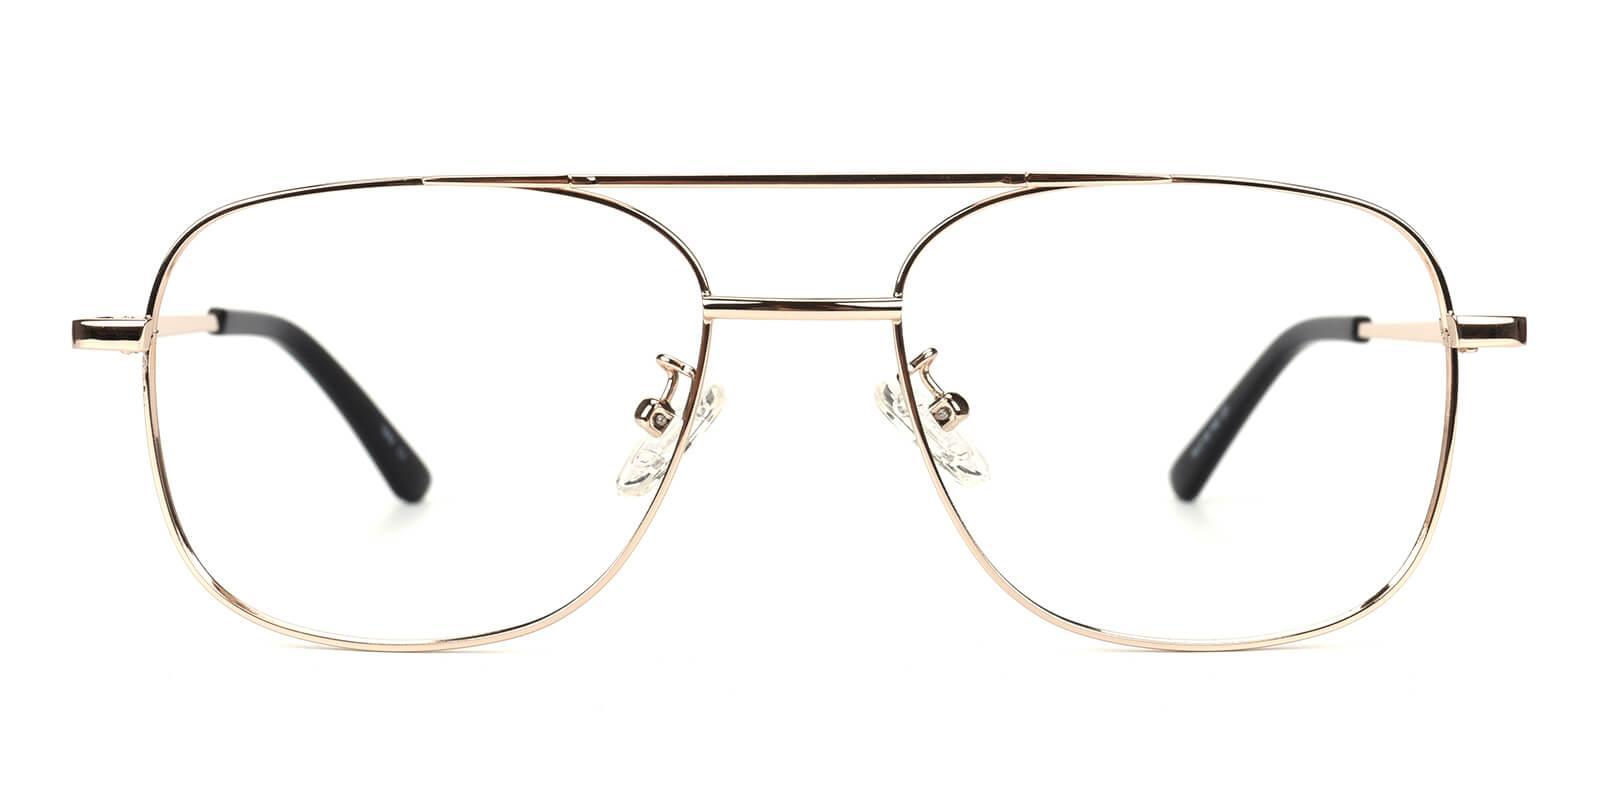 Sally-Gold-Aviator-Metal-Eyeglasses-additional2